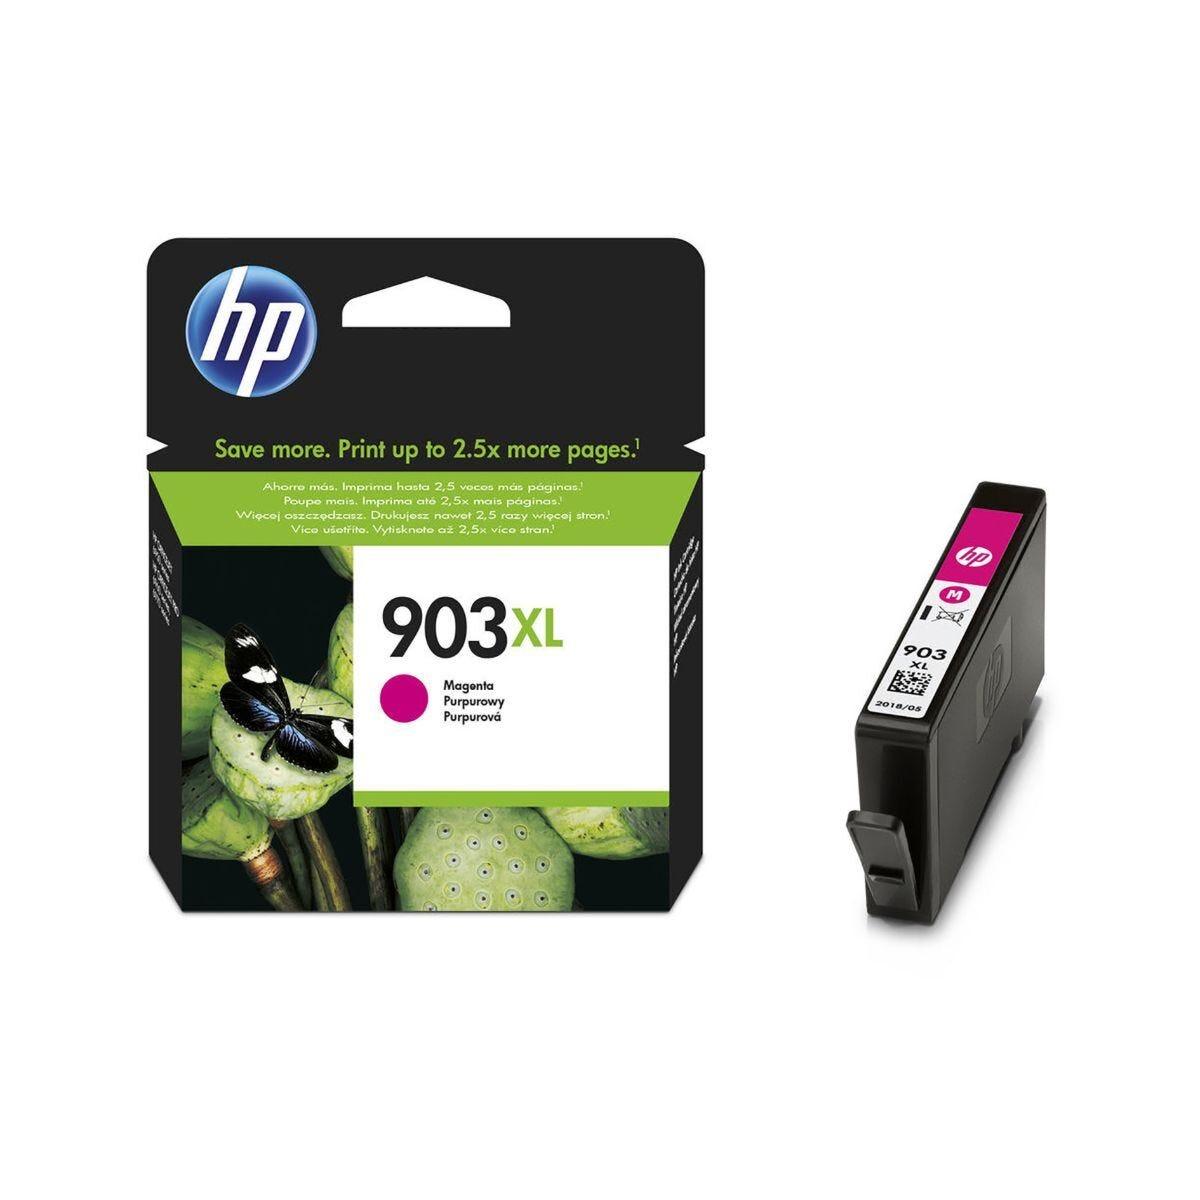 HP 903XL Ink Cartridge Magenta